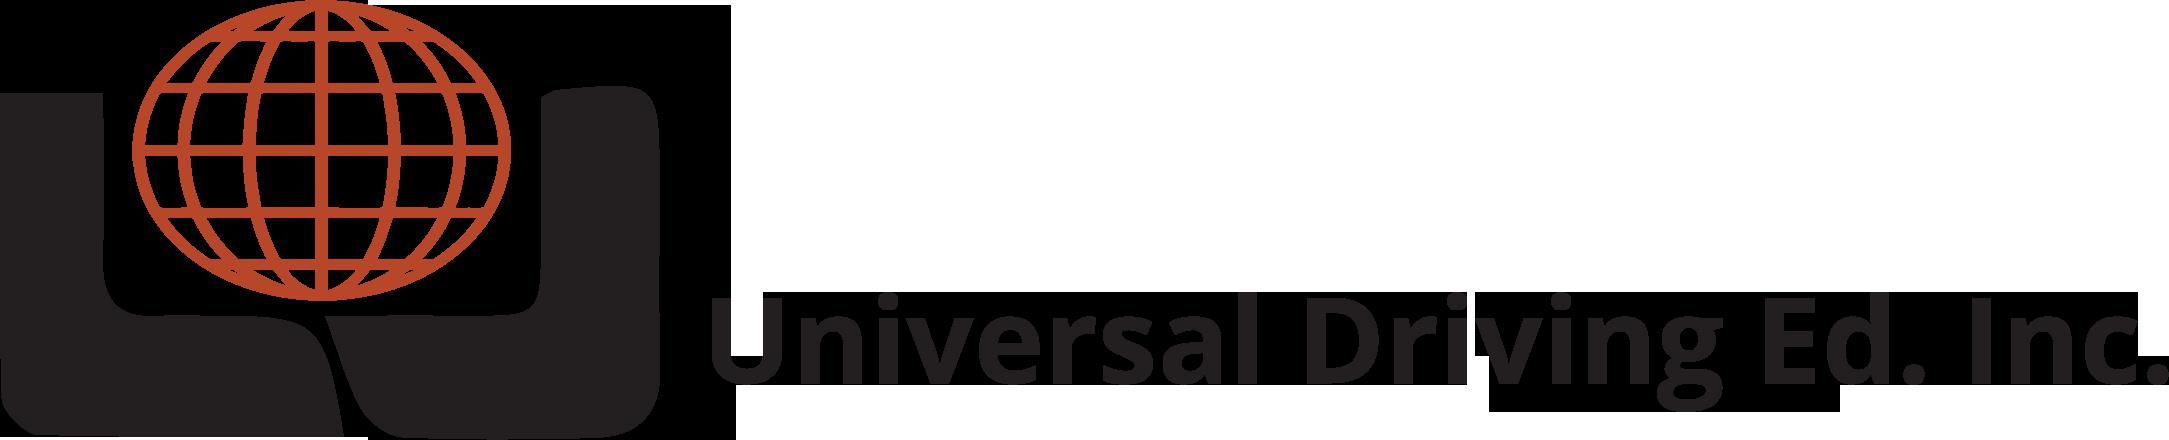 Universal Driving Education Inc.